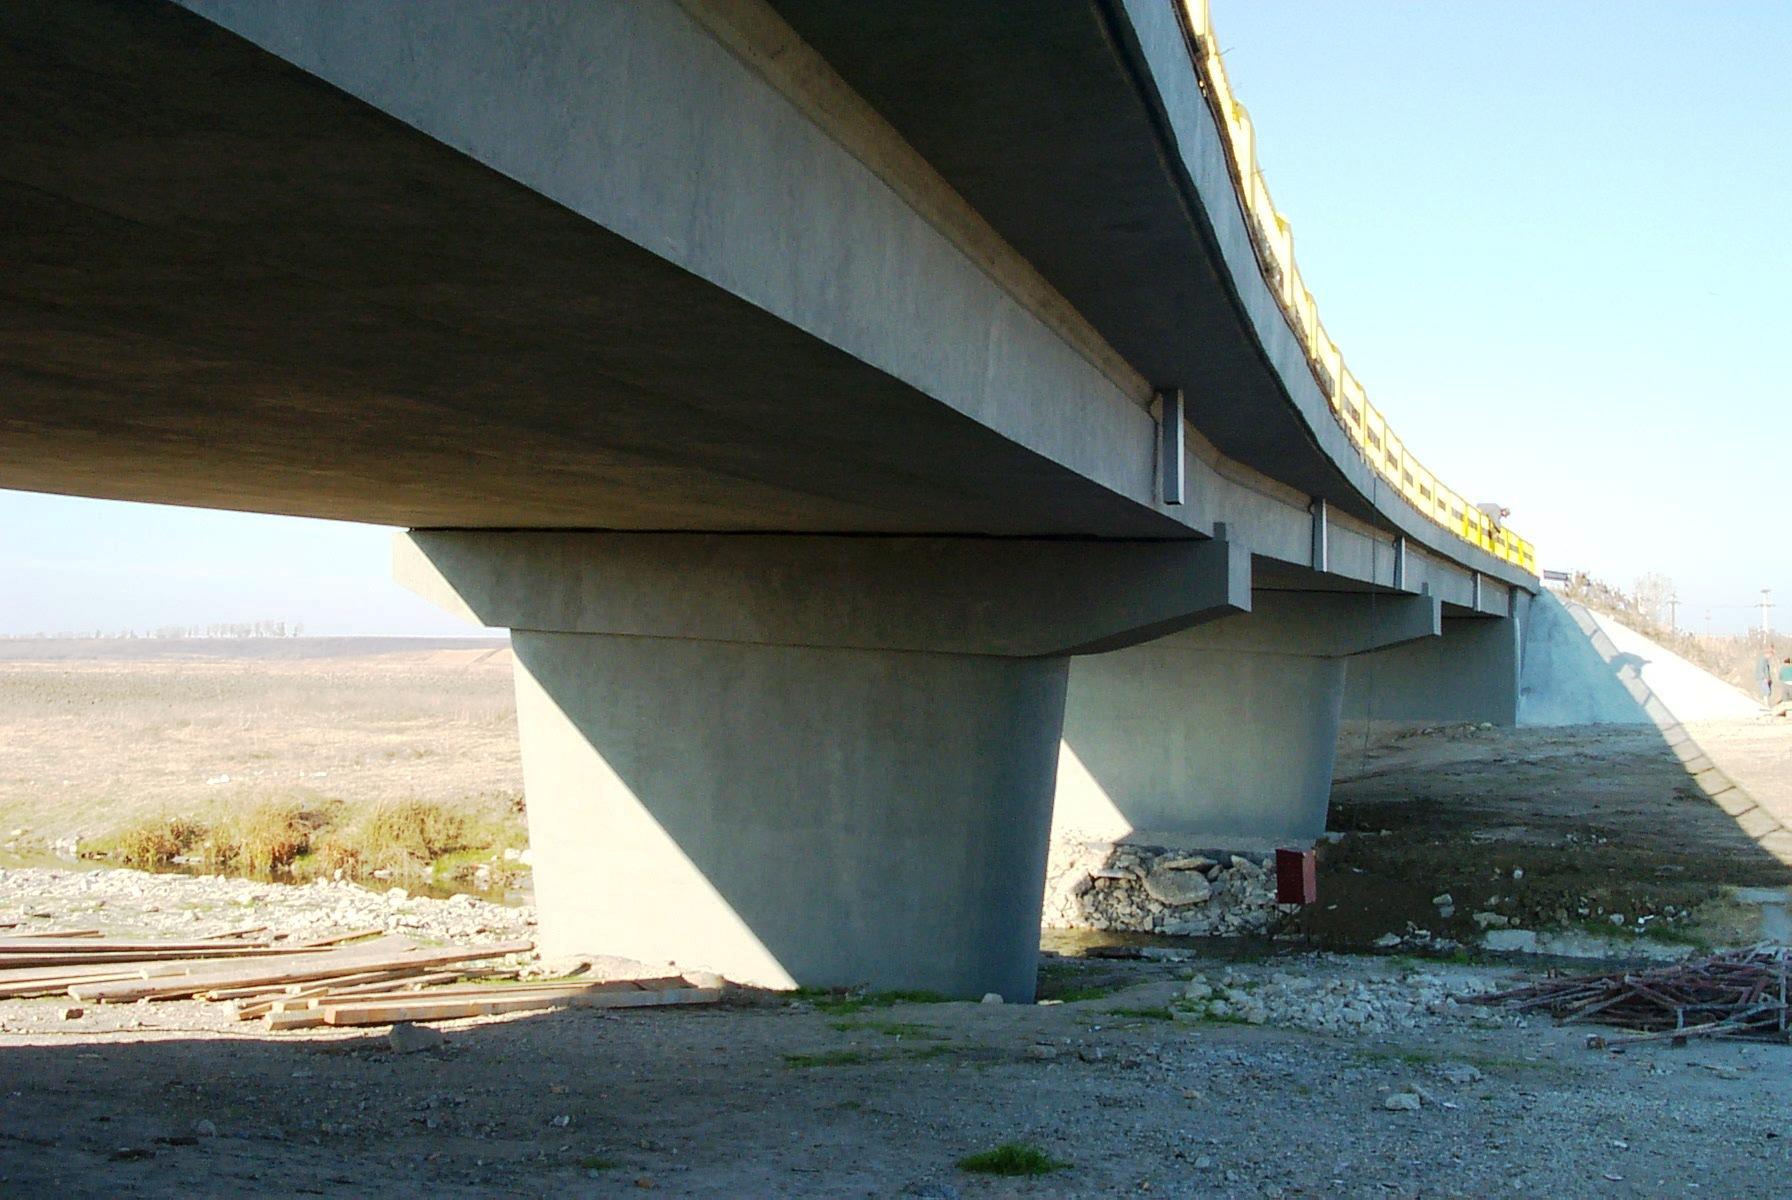 Reparatii pod (DN2), Km. 33 - 028, peste raul Calnistea MAPEI - Poza 19